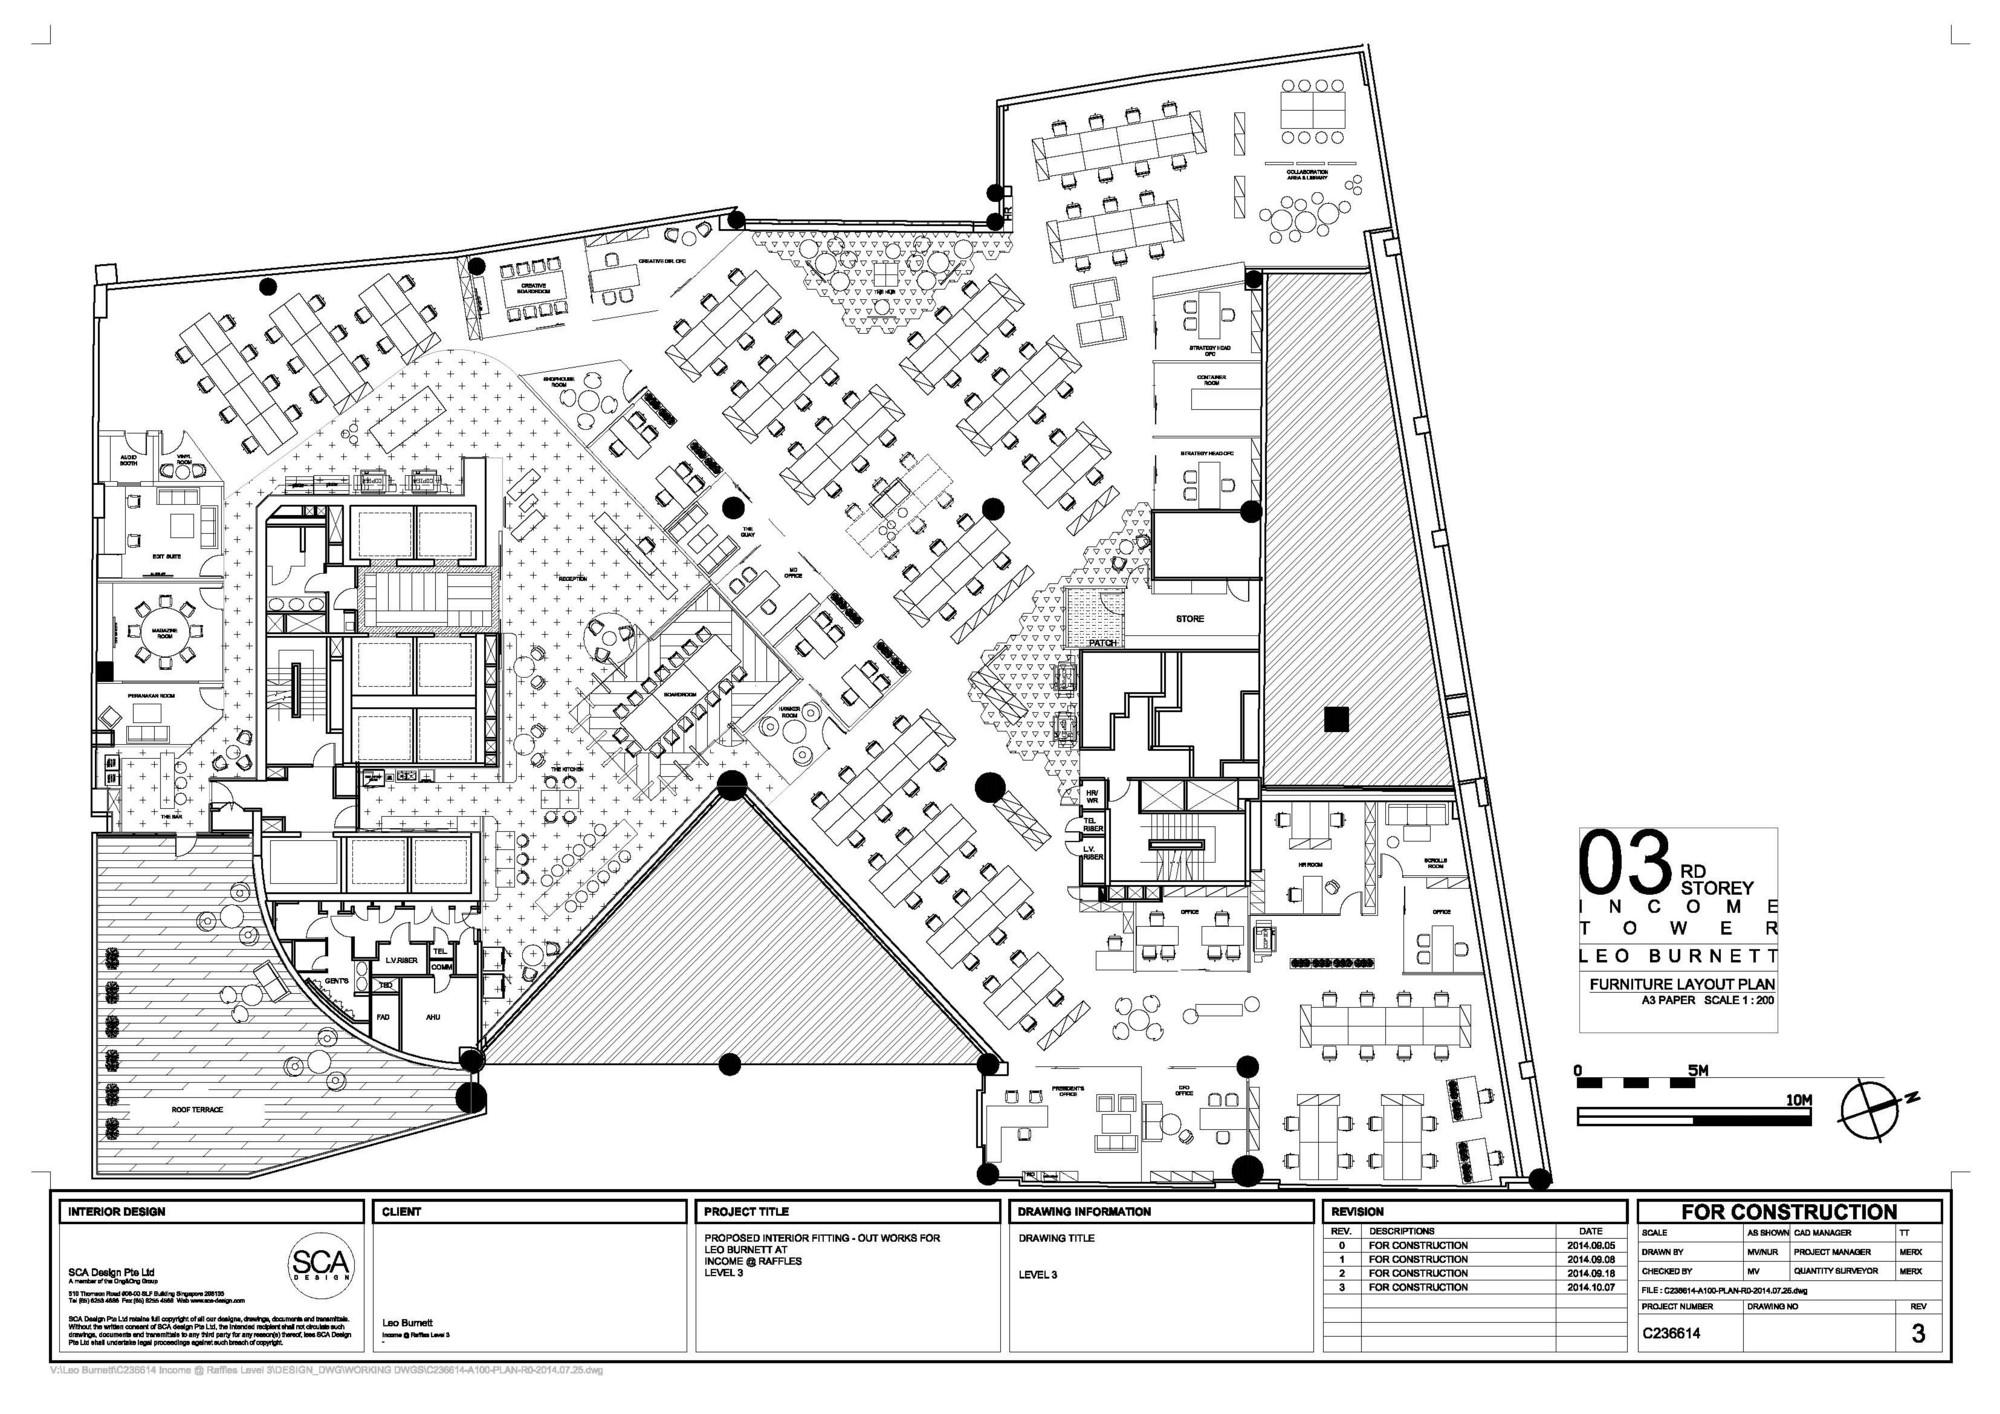 Gallery of leo burnett singapore sca design 24 for How to plan a website